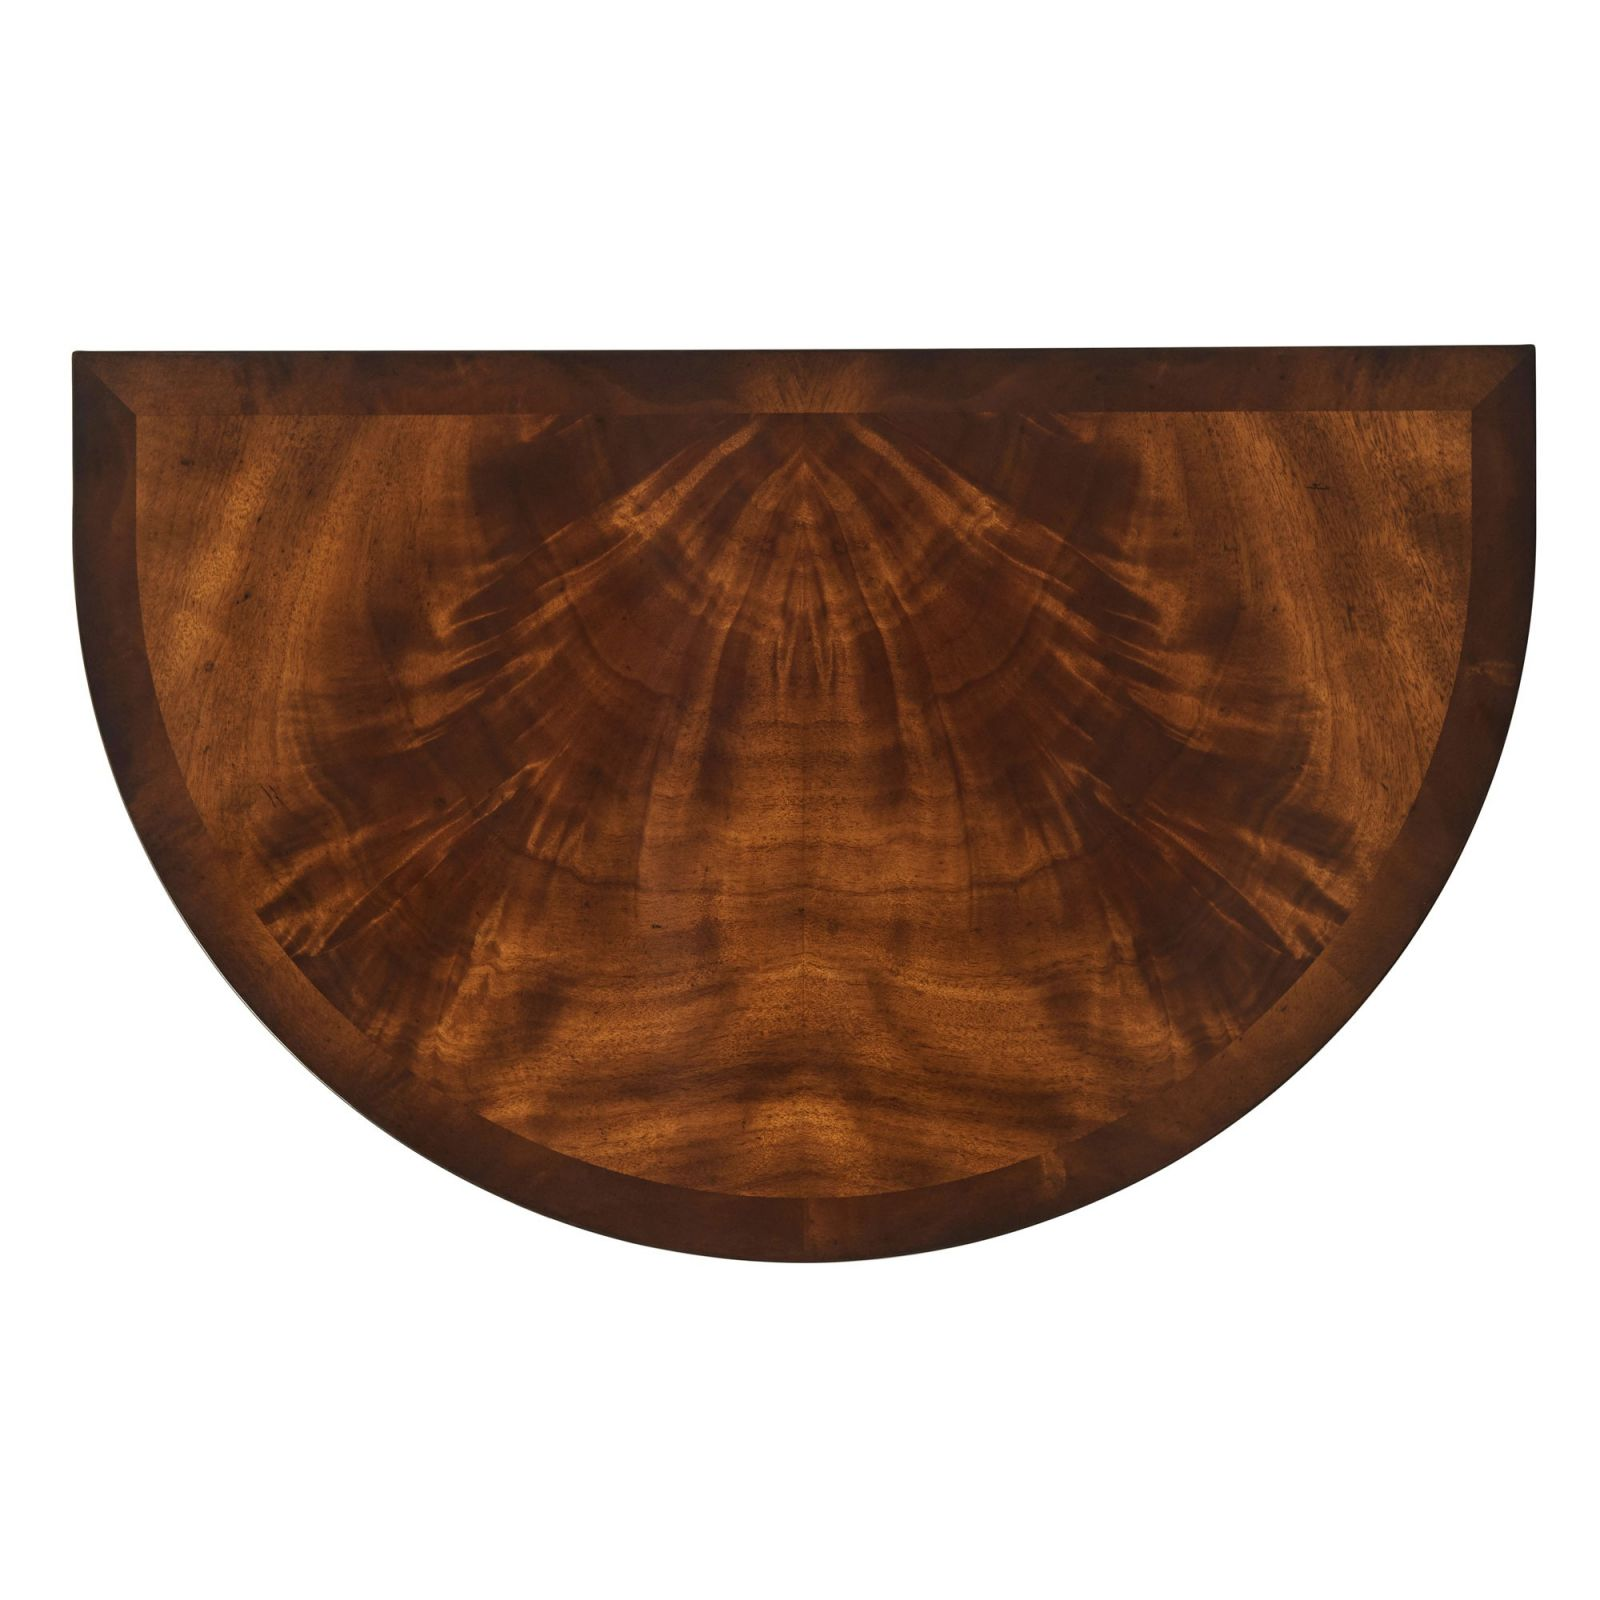 Mahogany demilune console table